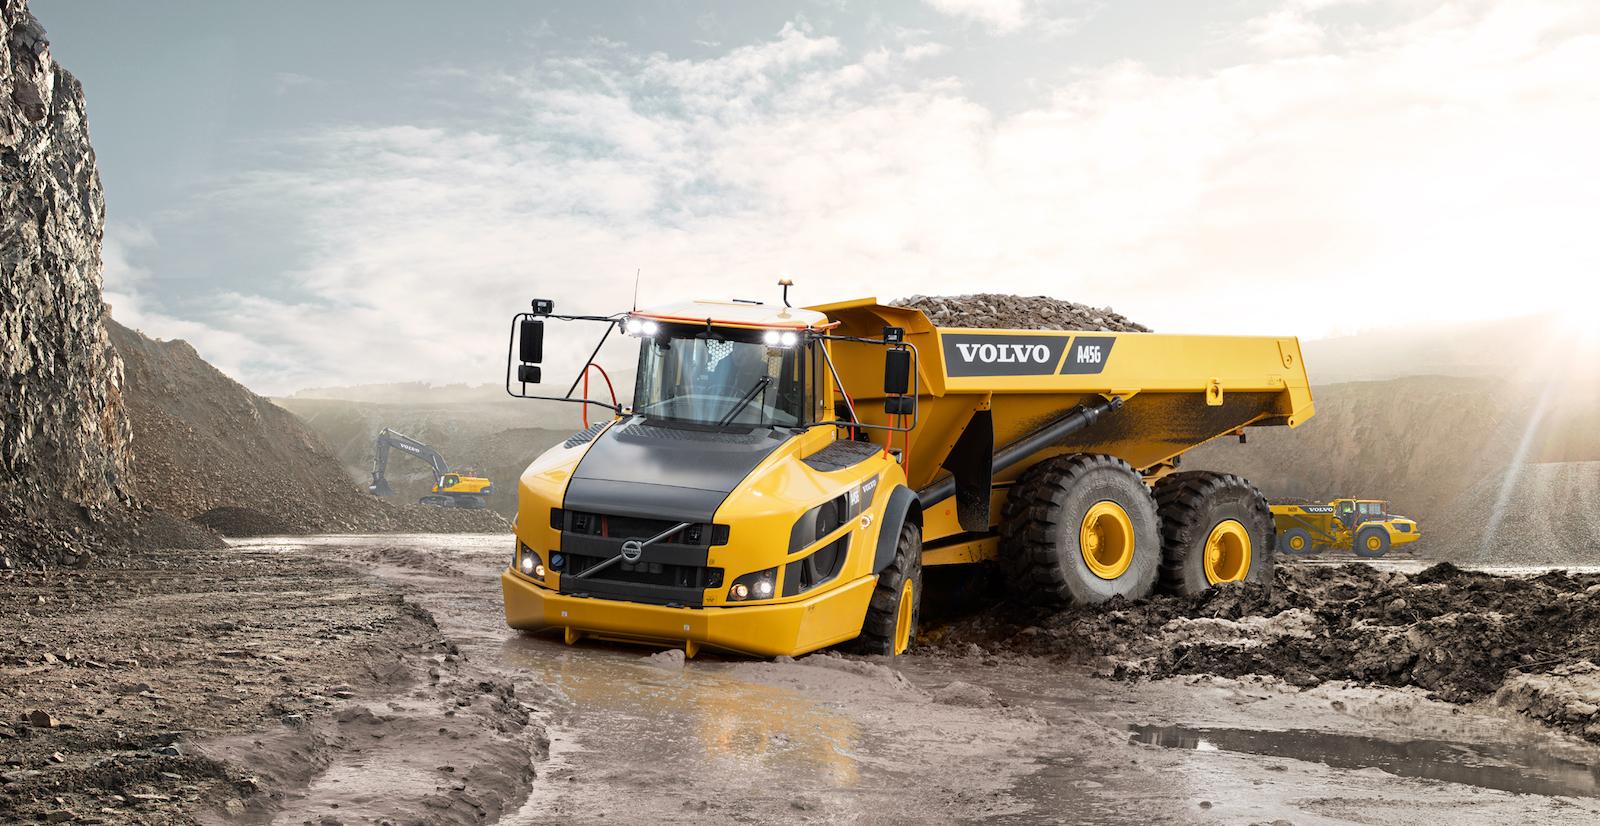 Volvo Dumper a45g